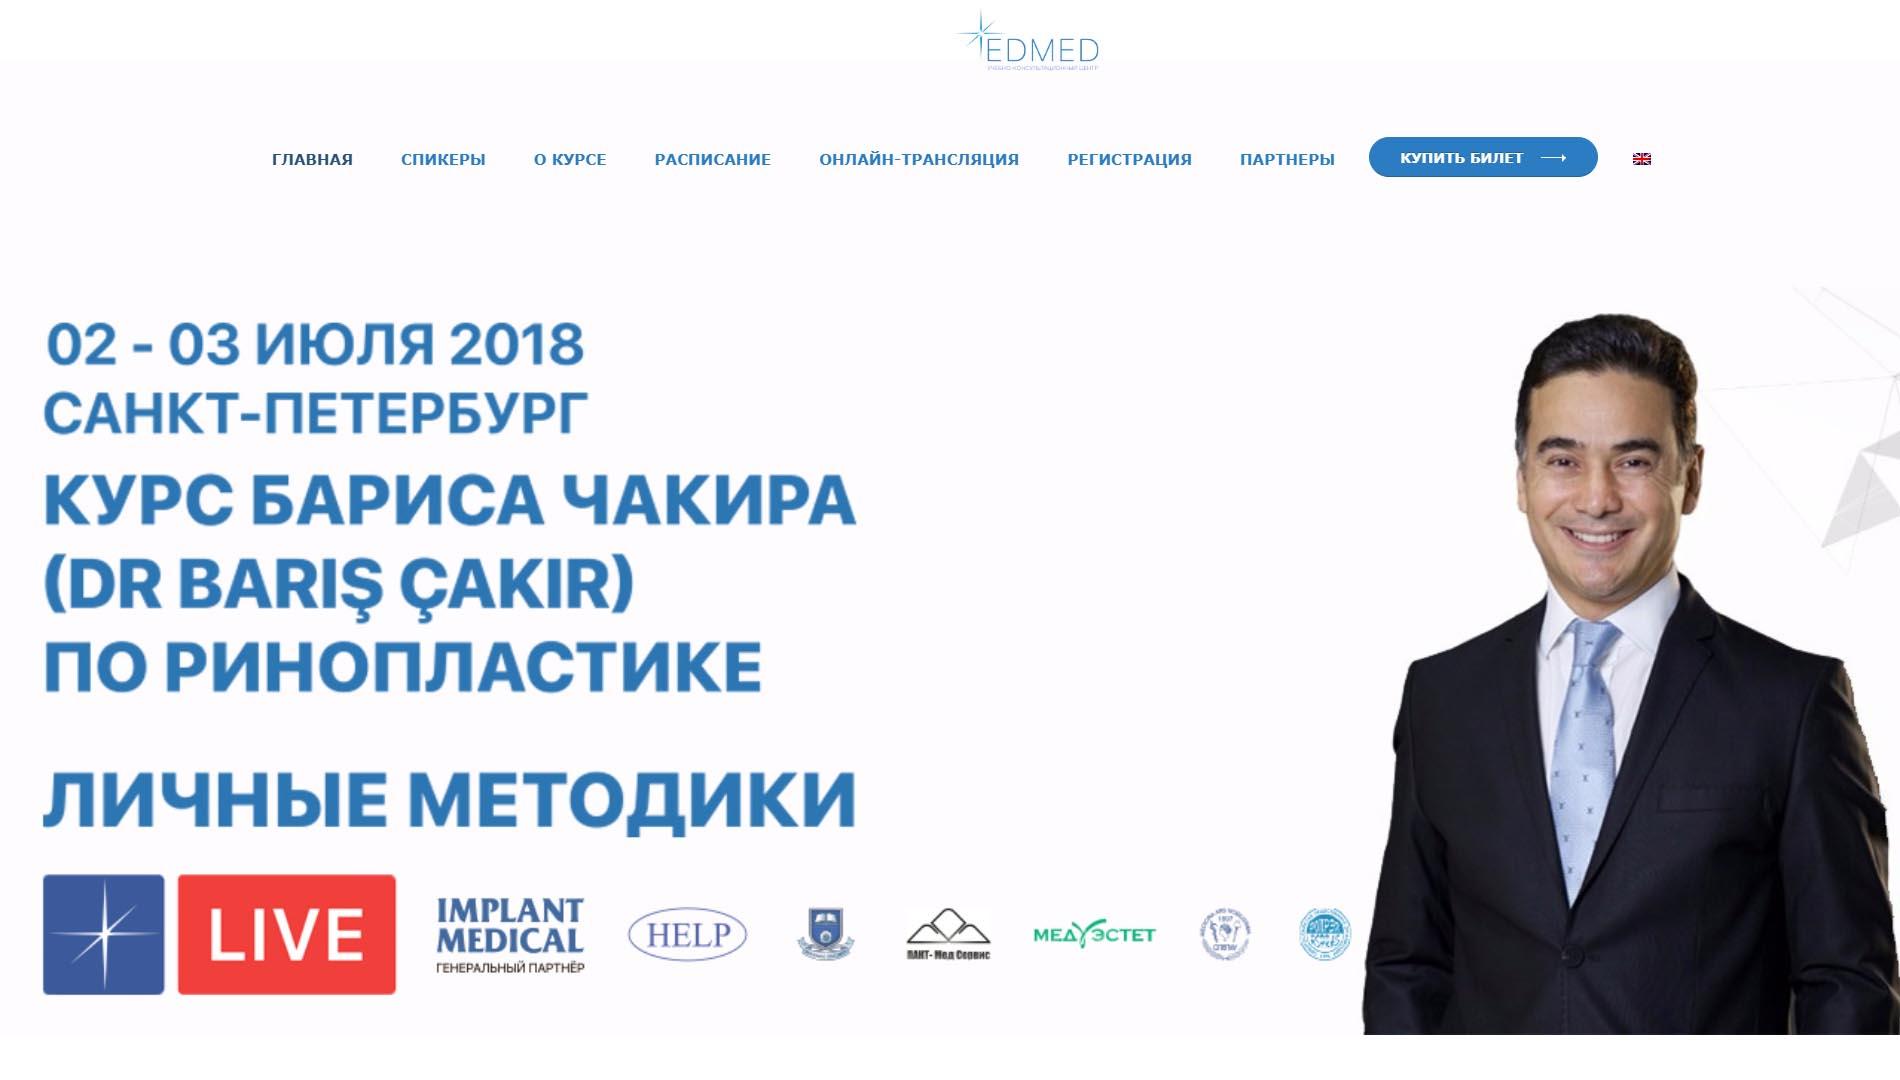 Cakir.edmed.ru